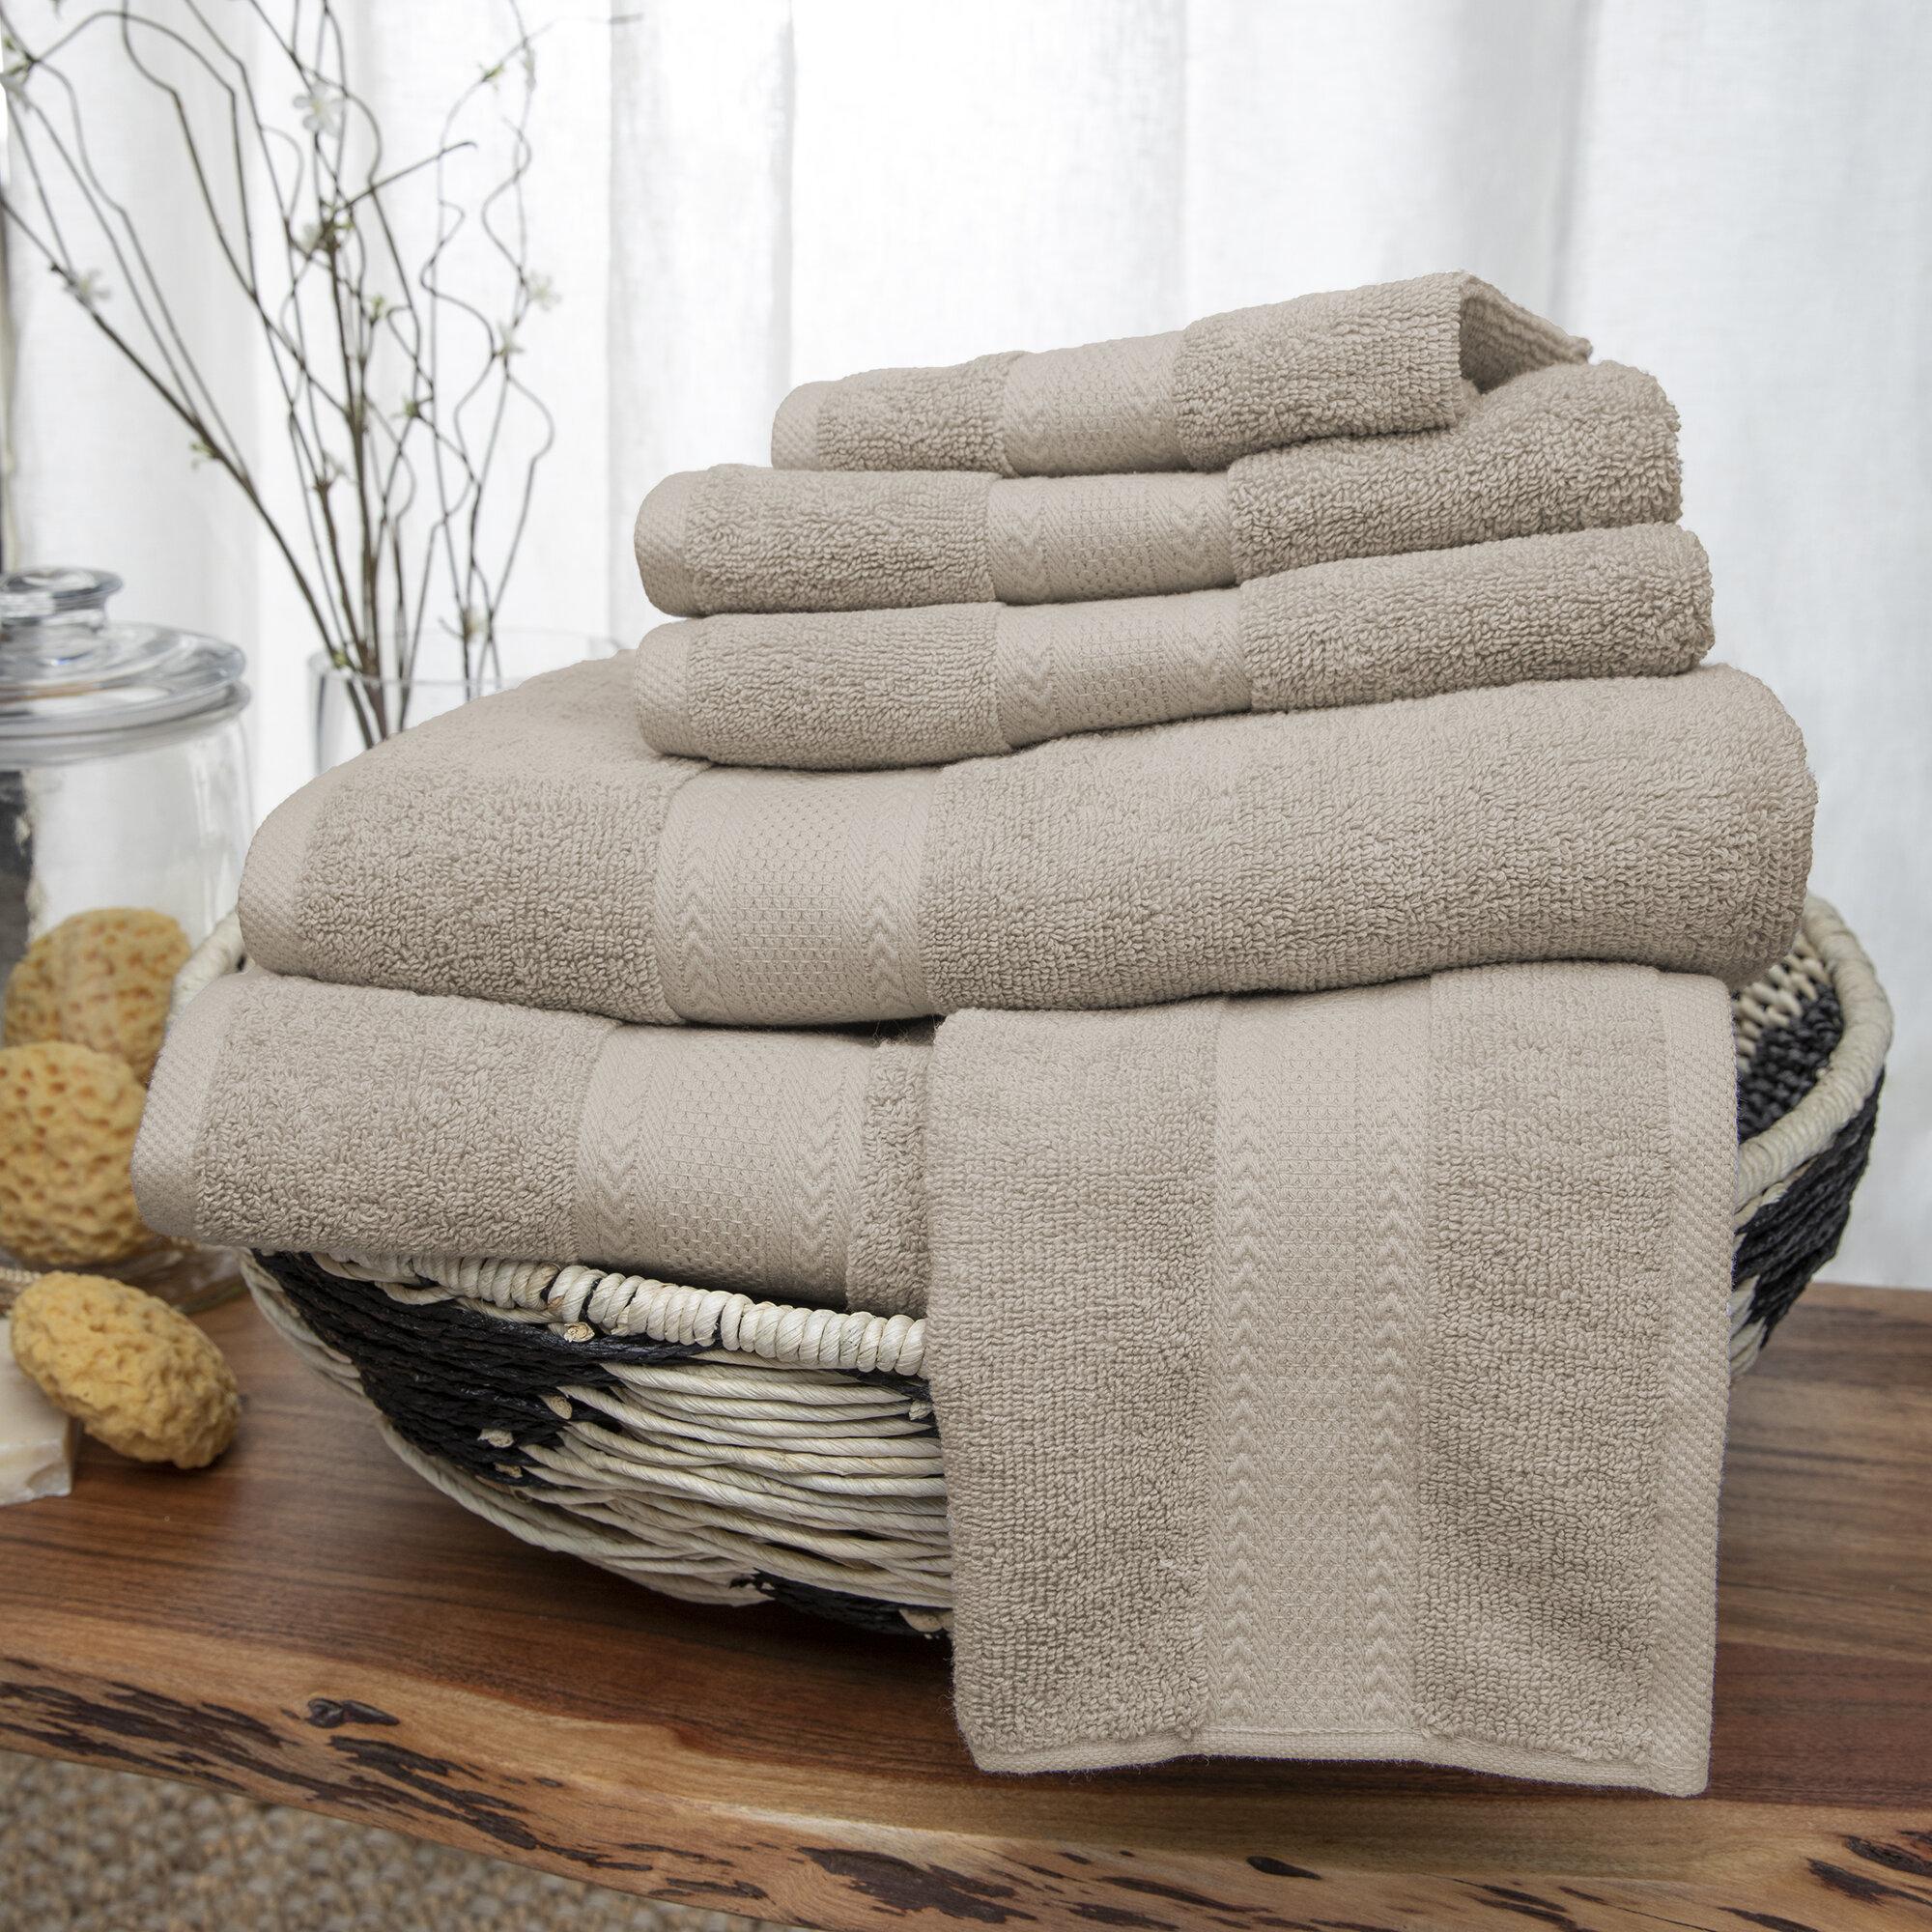 3-Piece  100/% Cotton Towels Low Twist Yarn Bath Hand Face Towel Set Gift box